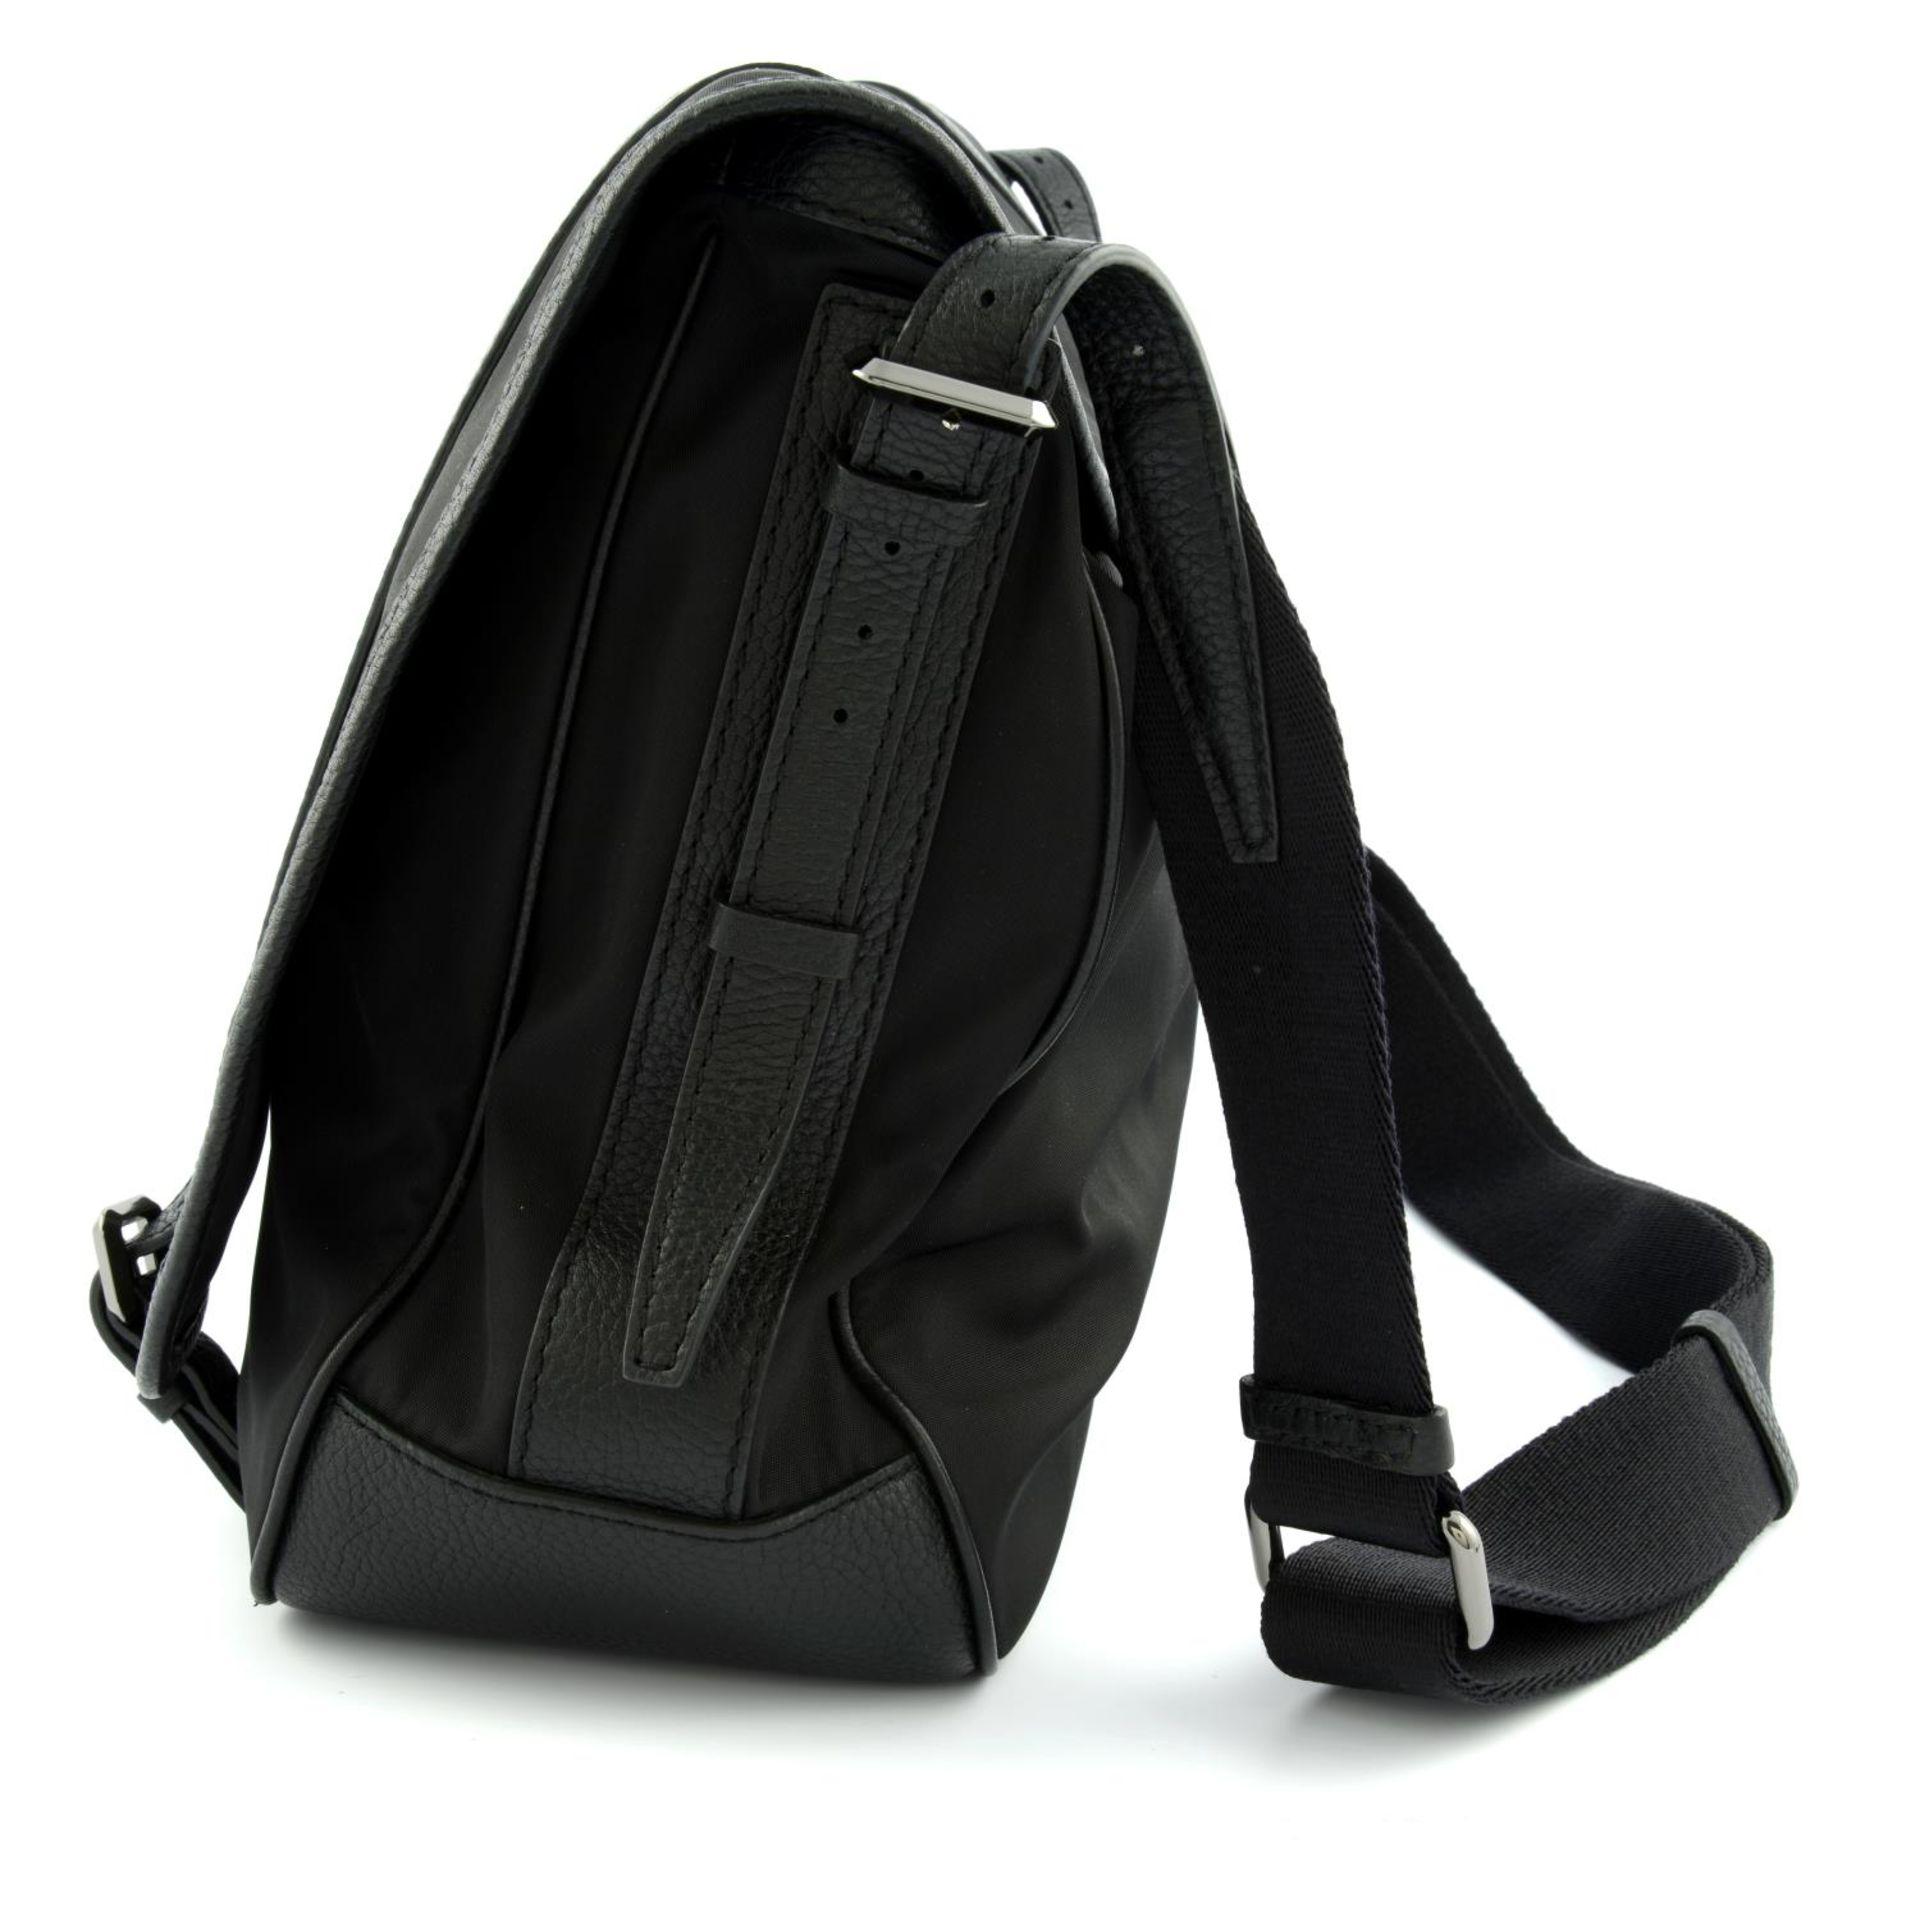 BURBERRY - a nylon messenger satchel. - Image 2 of 5